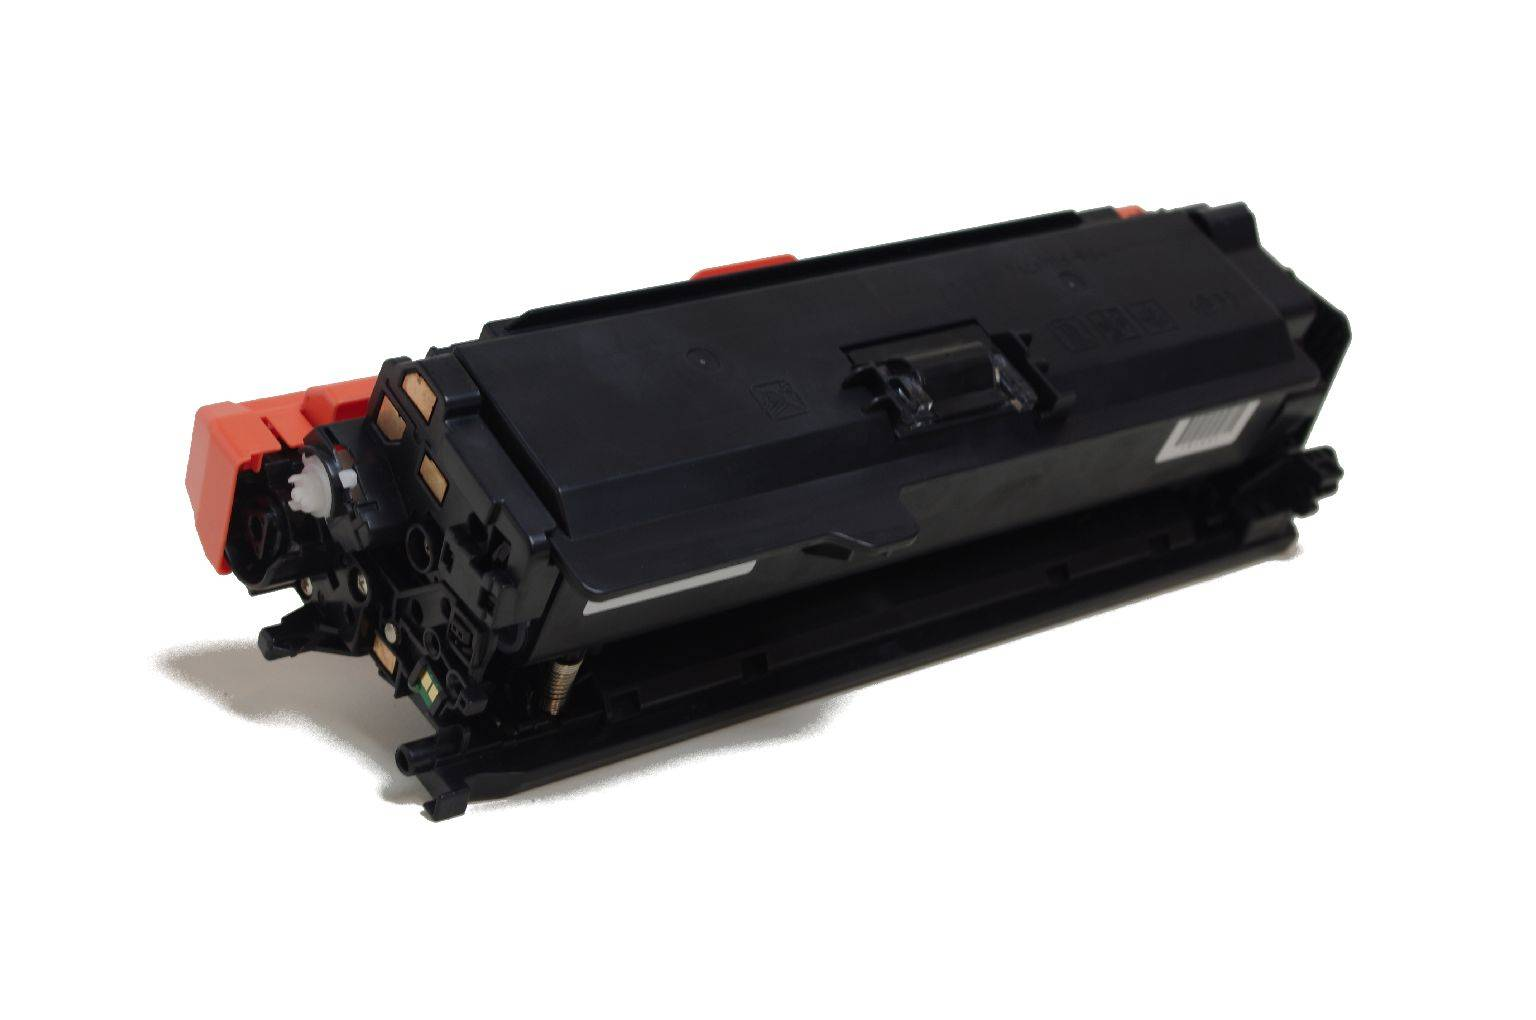 Canon Cartouche de Toner pour Canon 2645B002 / 723H noir compatible (de marque ASC)